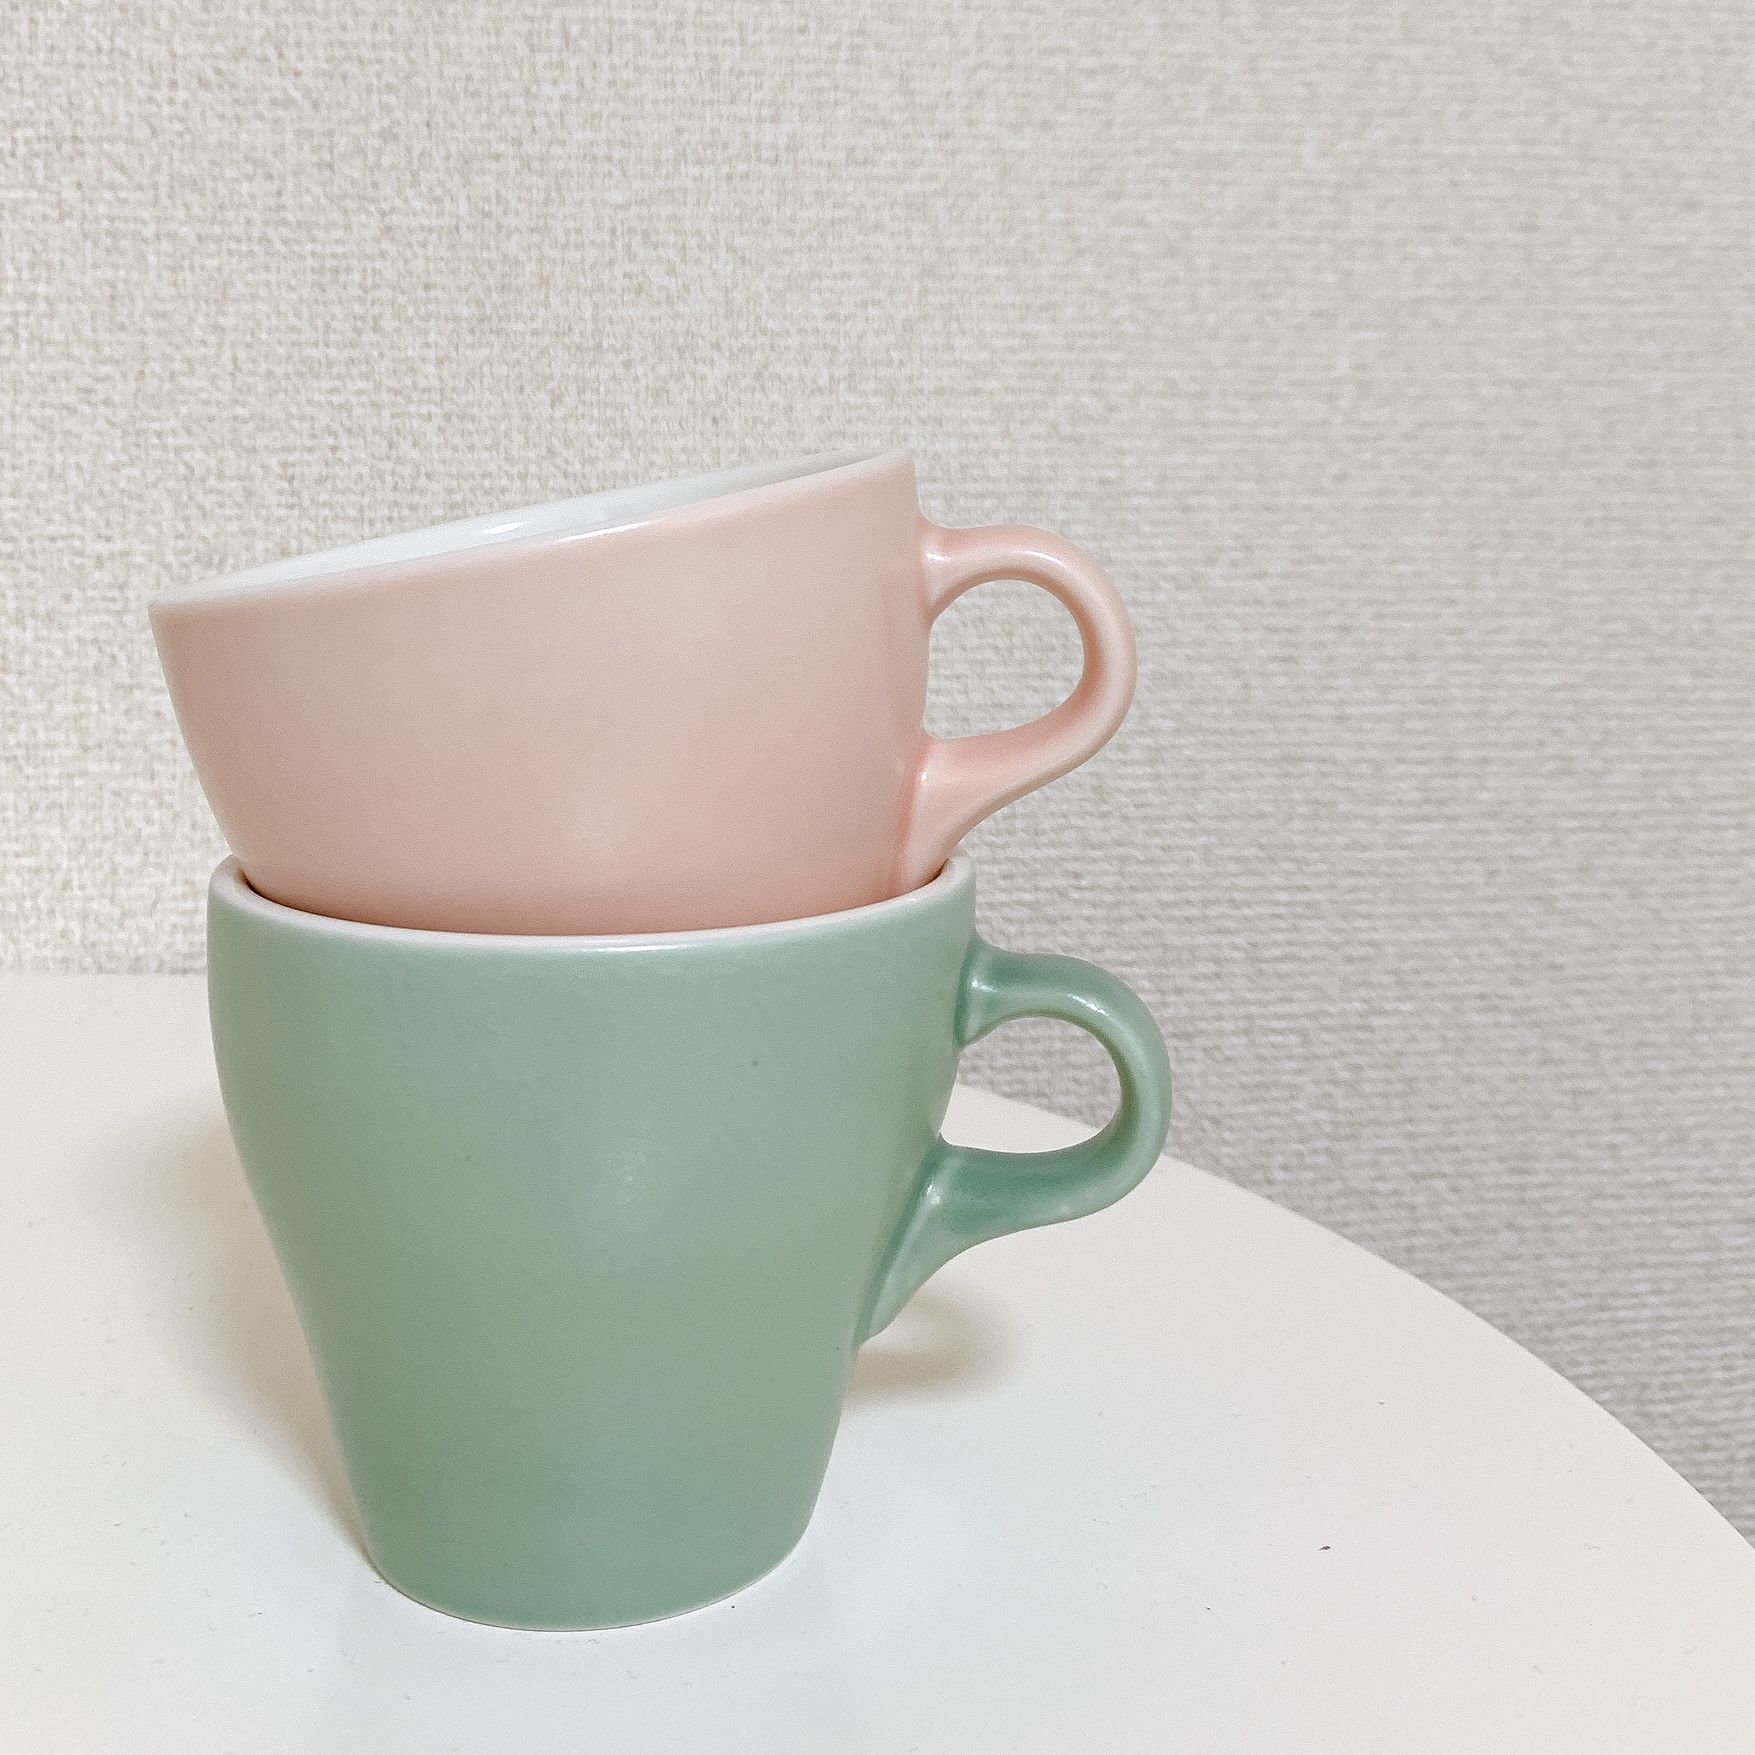 ORIGAMI(オリガミ)6オンス カプチーノカップを使ったのんさんのクチコミ画像1